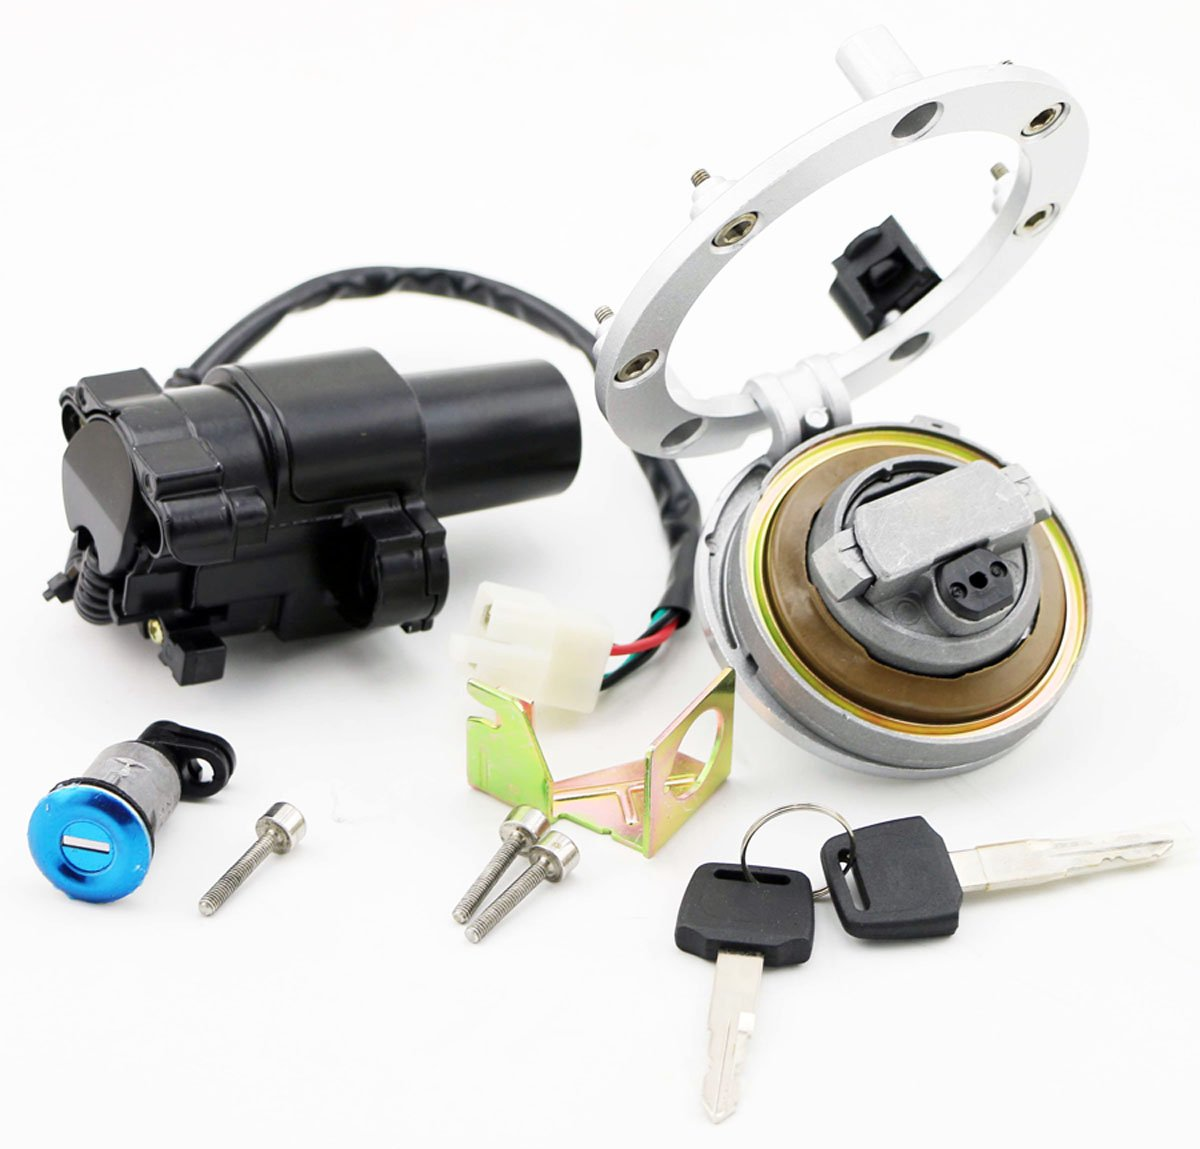 New Honda Cbr1000rr 2004 2007 Cbr600rr 2003 2006 Ignition Switch Wiring Lock Fuel Gas Cap Key Set Starter Amazon Canada